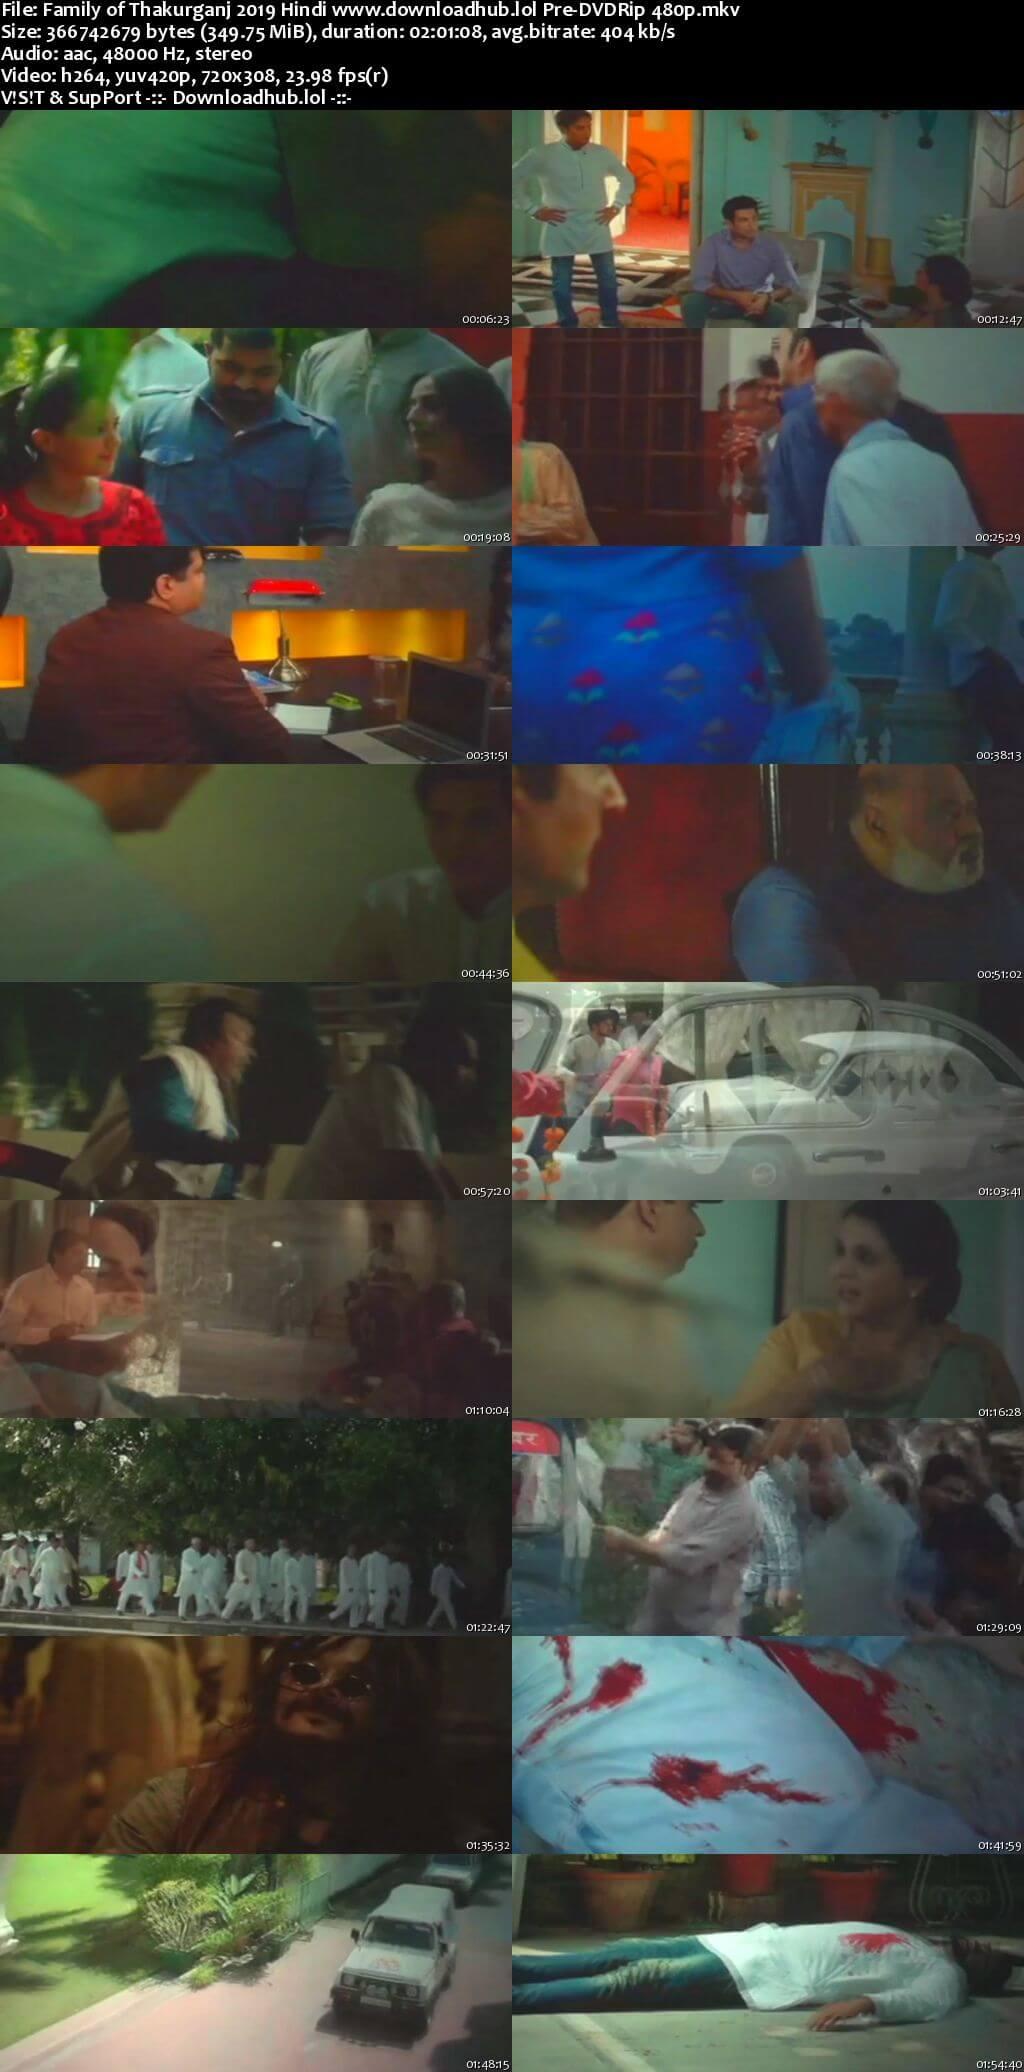 Family of Thakurganj 2019 Hindi 350MB Pre-DVDRip 480p